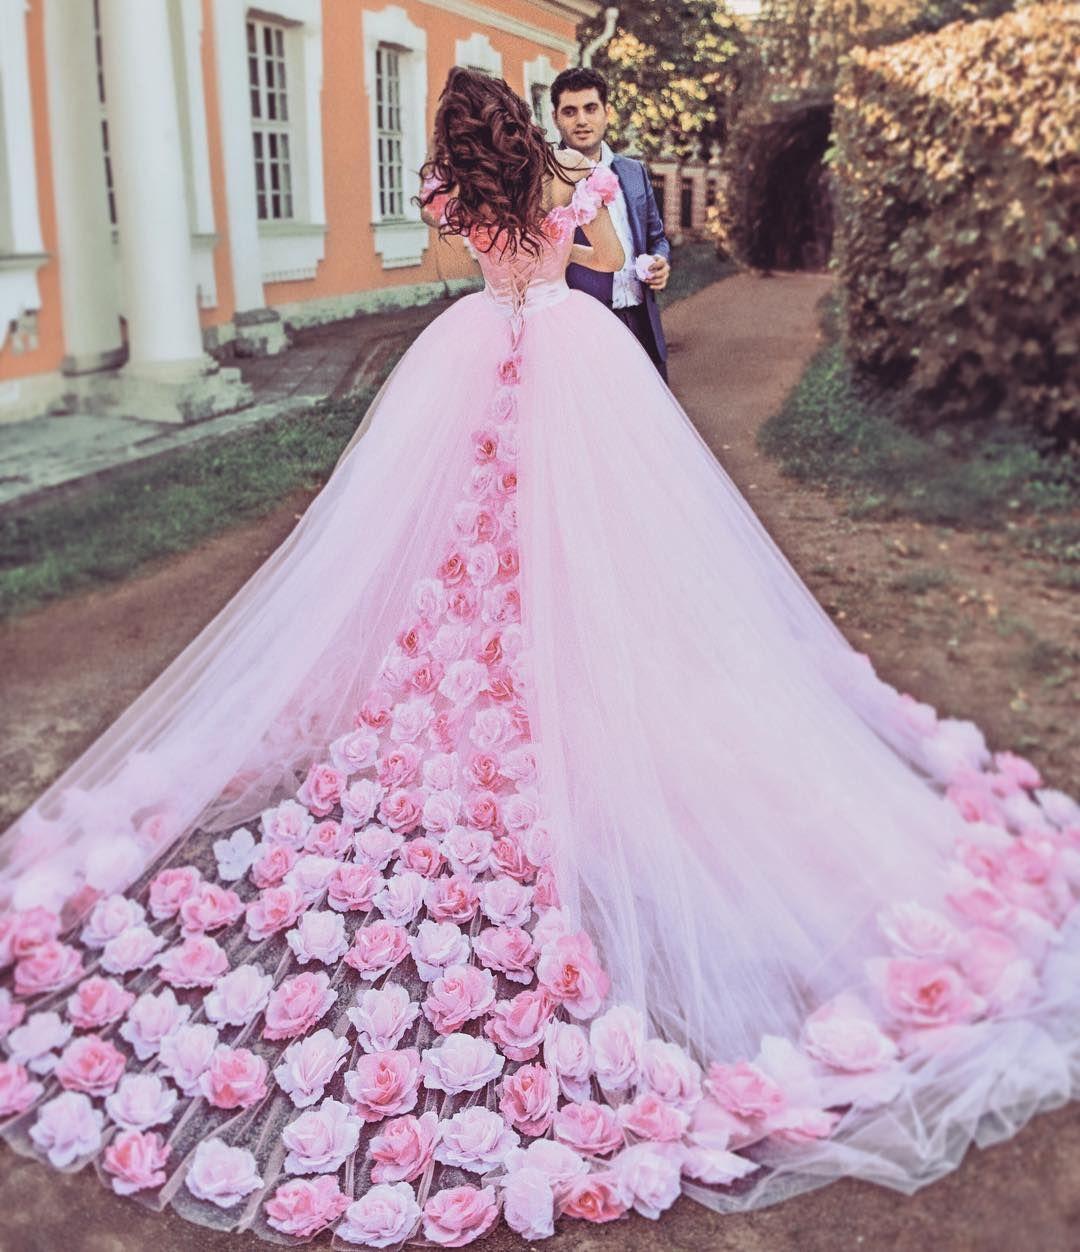 Rose Flower Wedding Dresses Pink Dress Ball Gown Fairytale Quinceanera